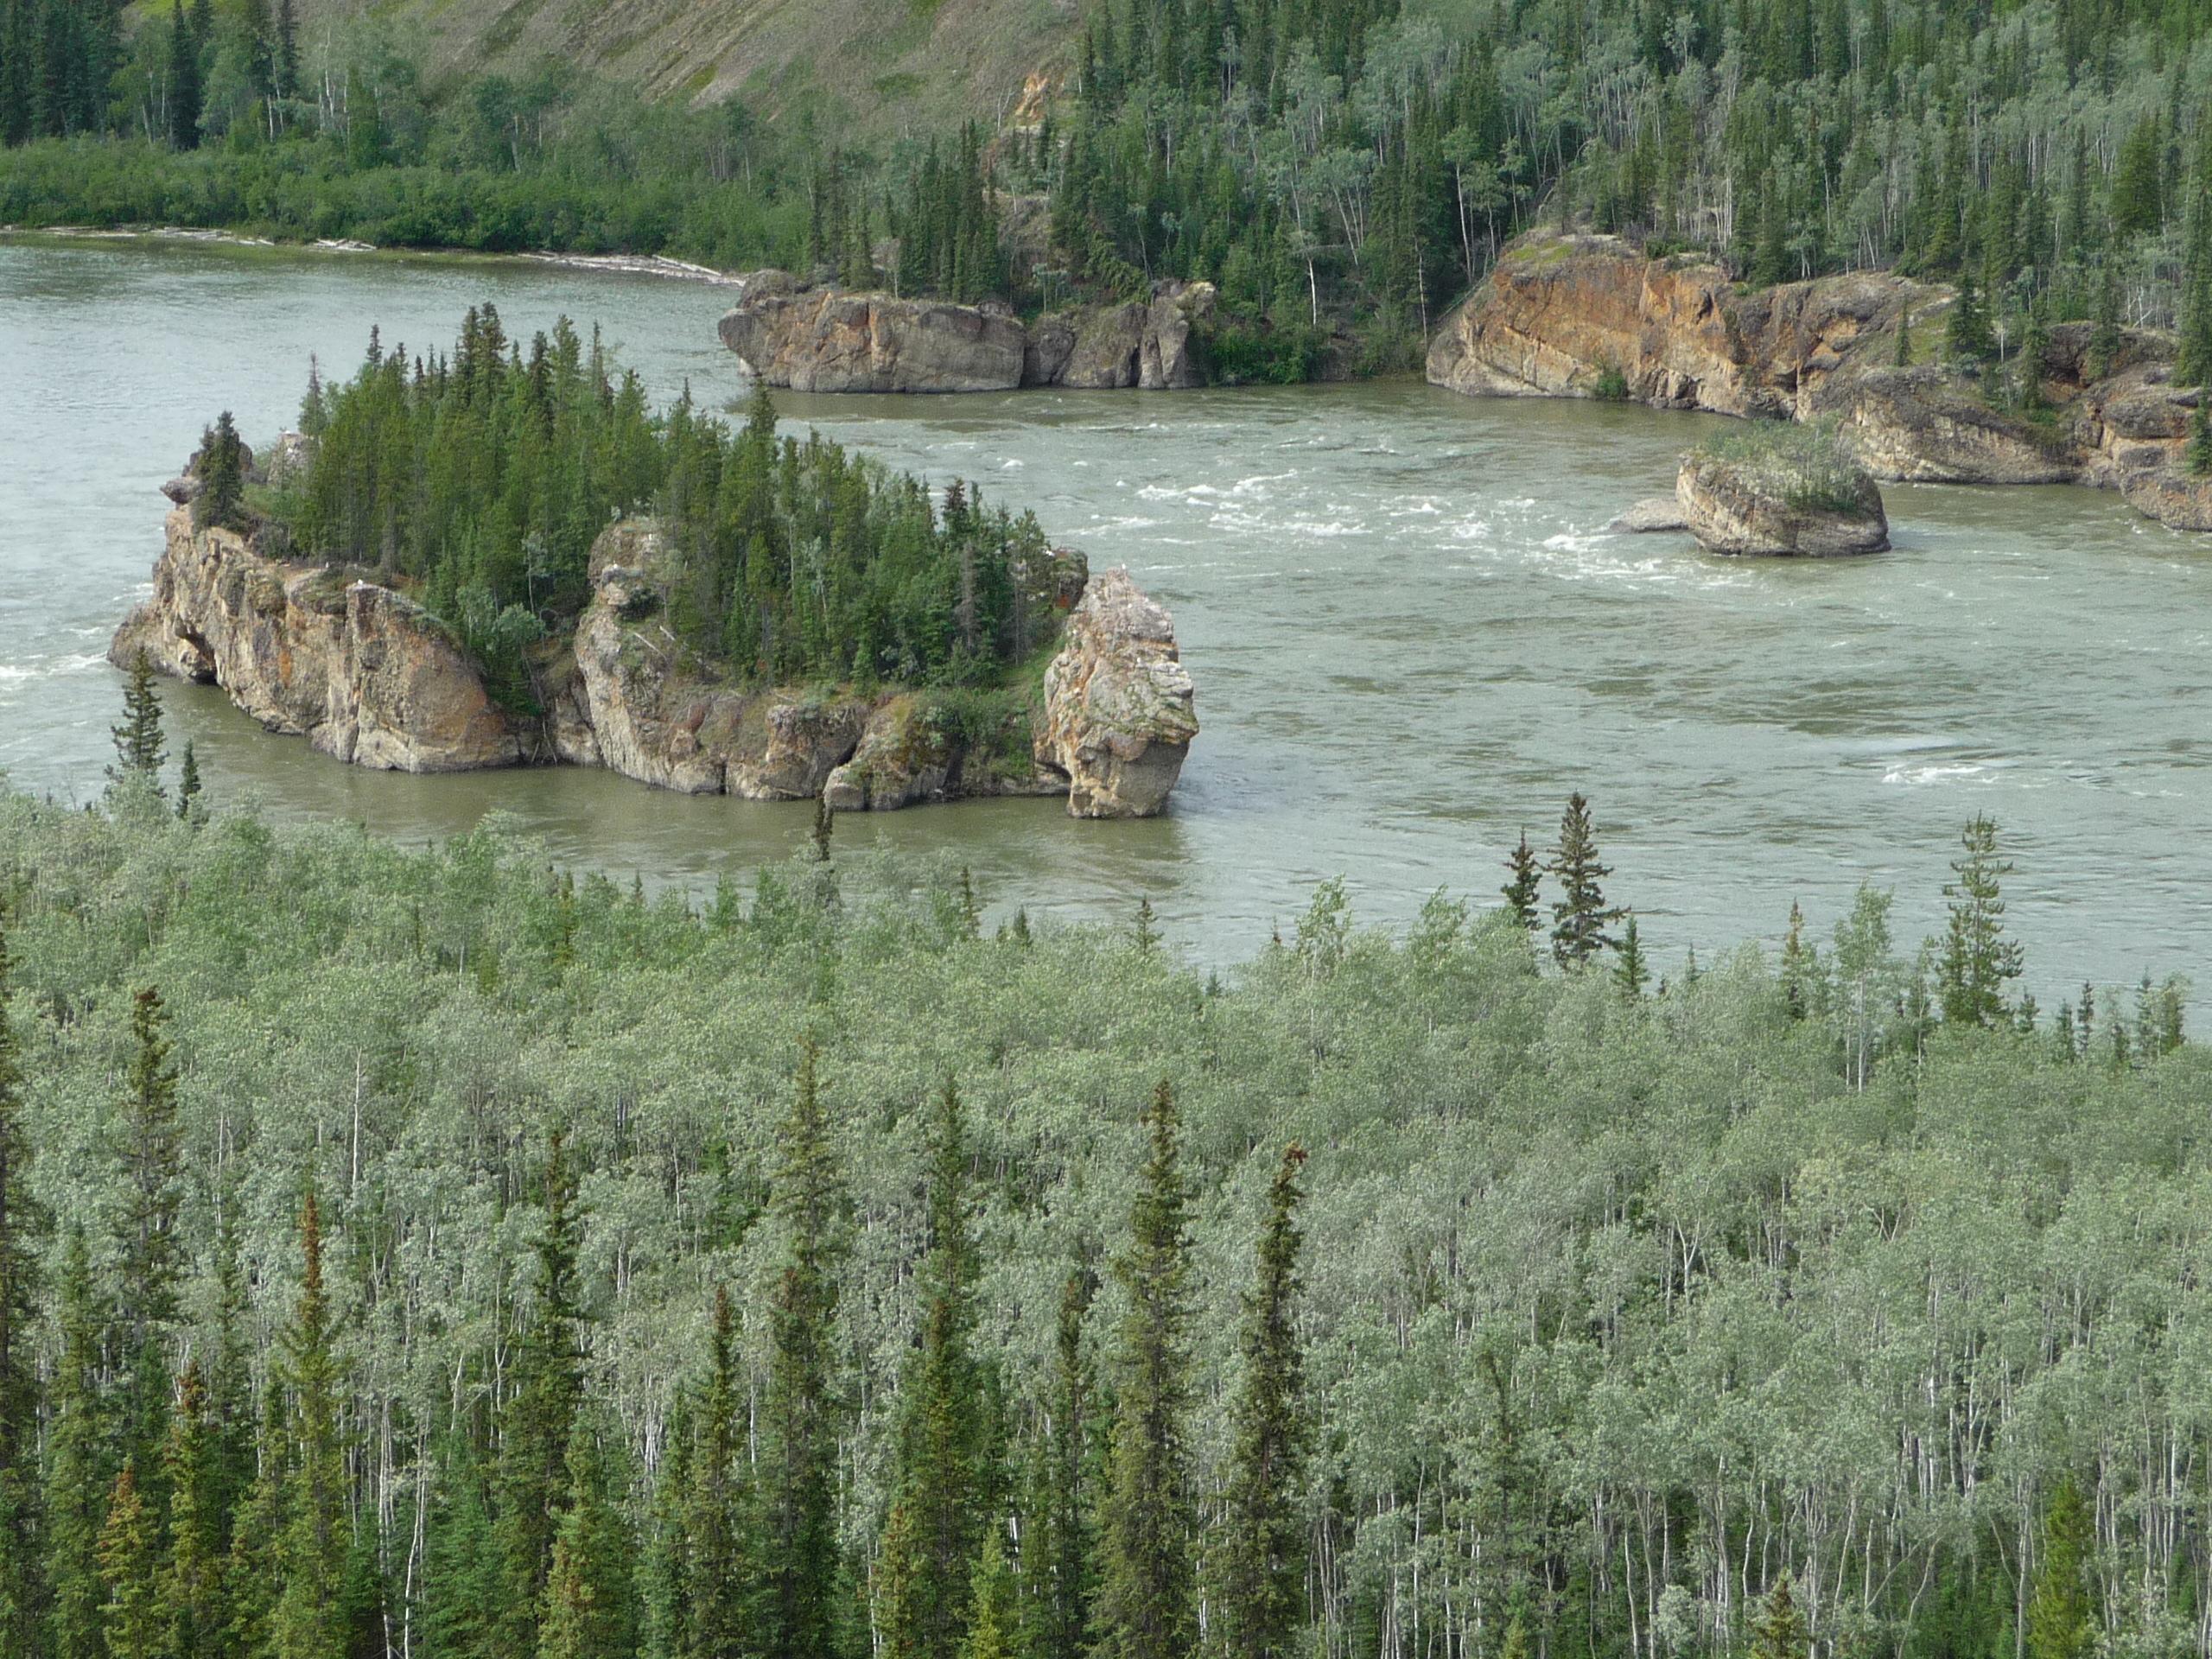 Canada rapids photo